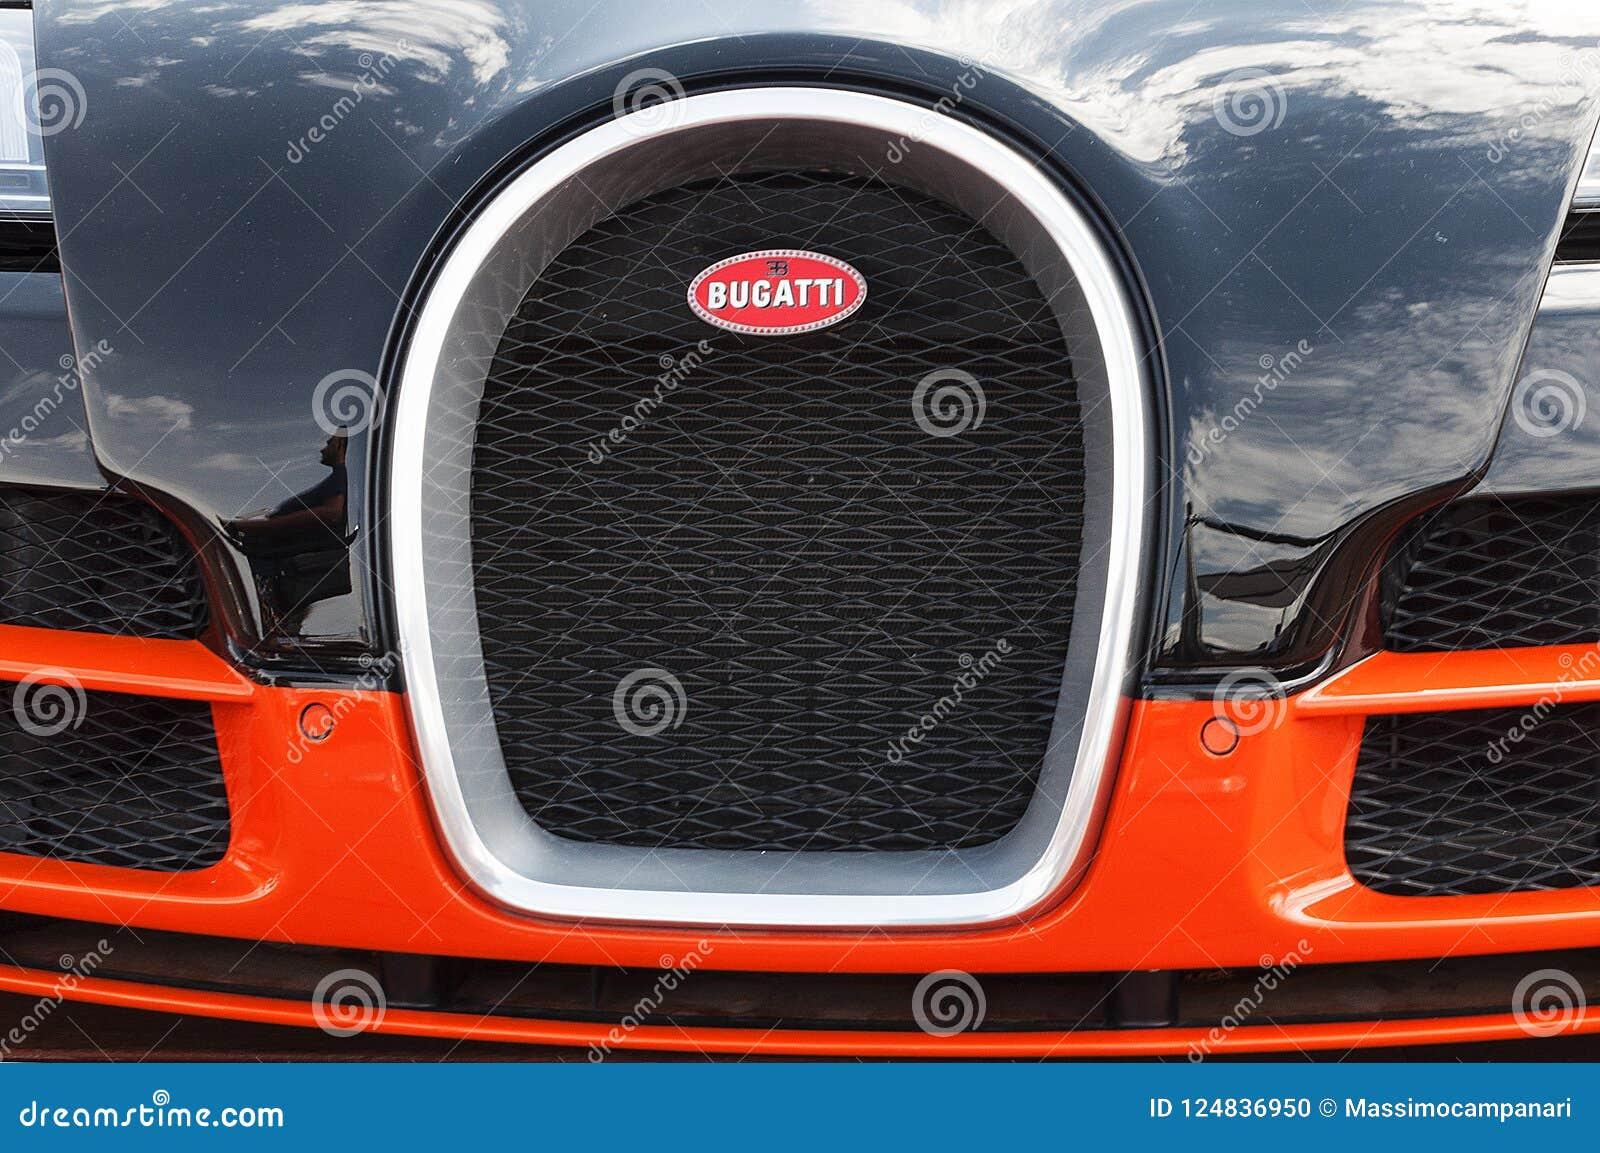 bugatti veyron on display at porto cervo in sardinia. the bugatti is